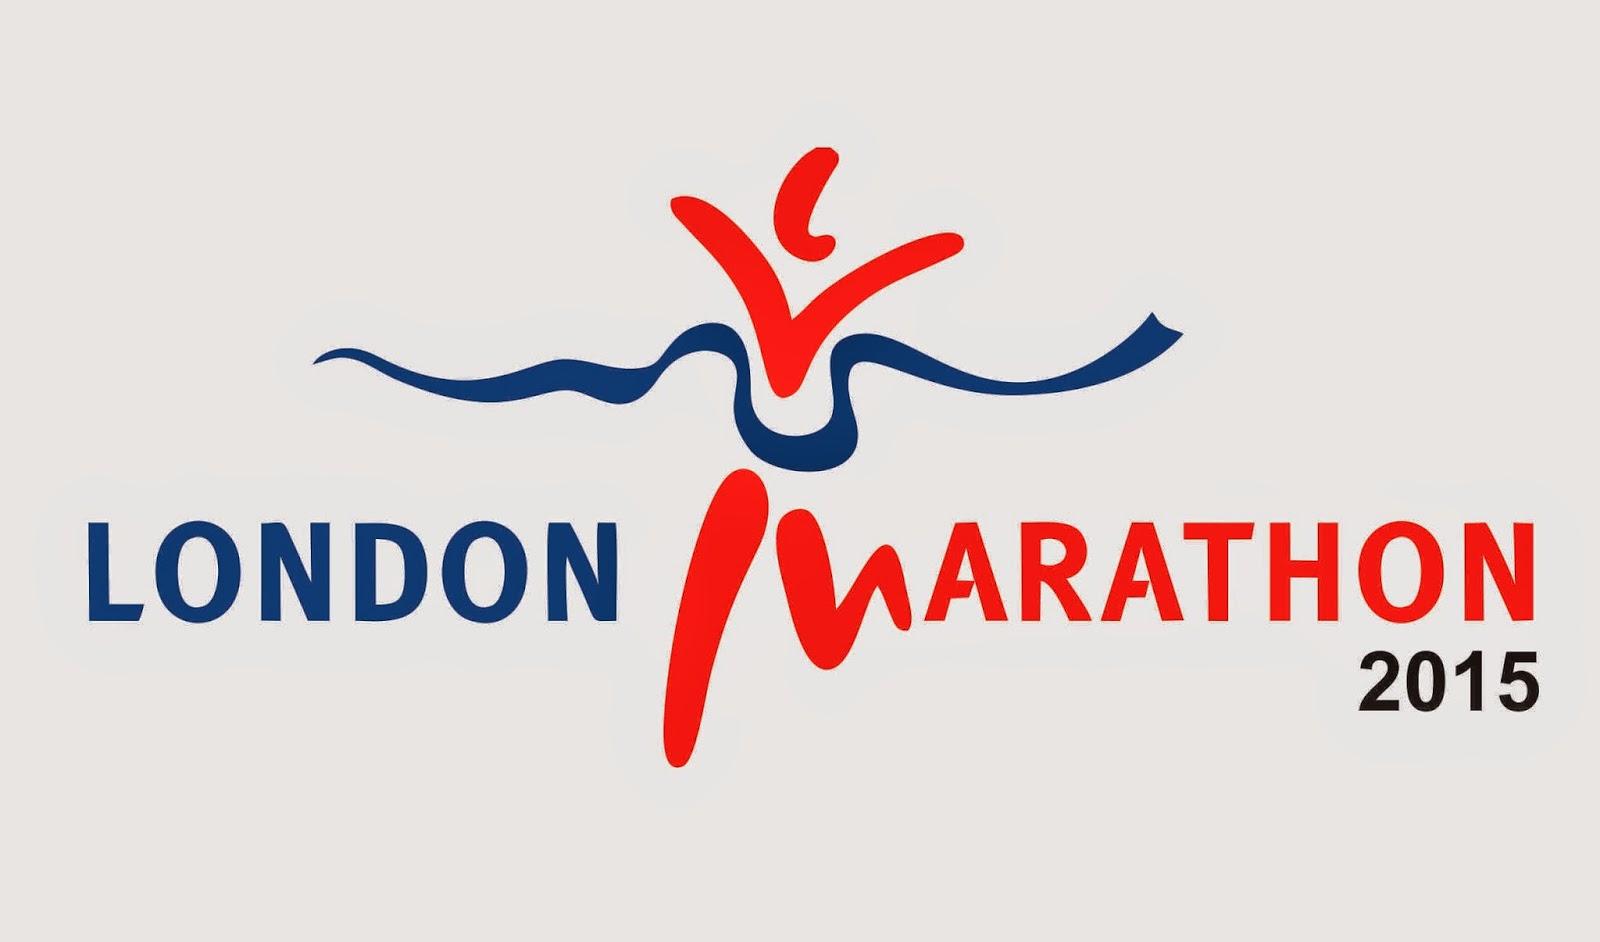 Marathon Logo Vector London Marathon Vector Logo